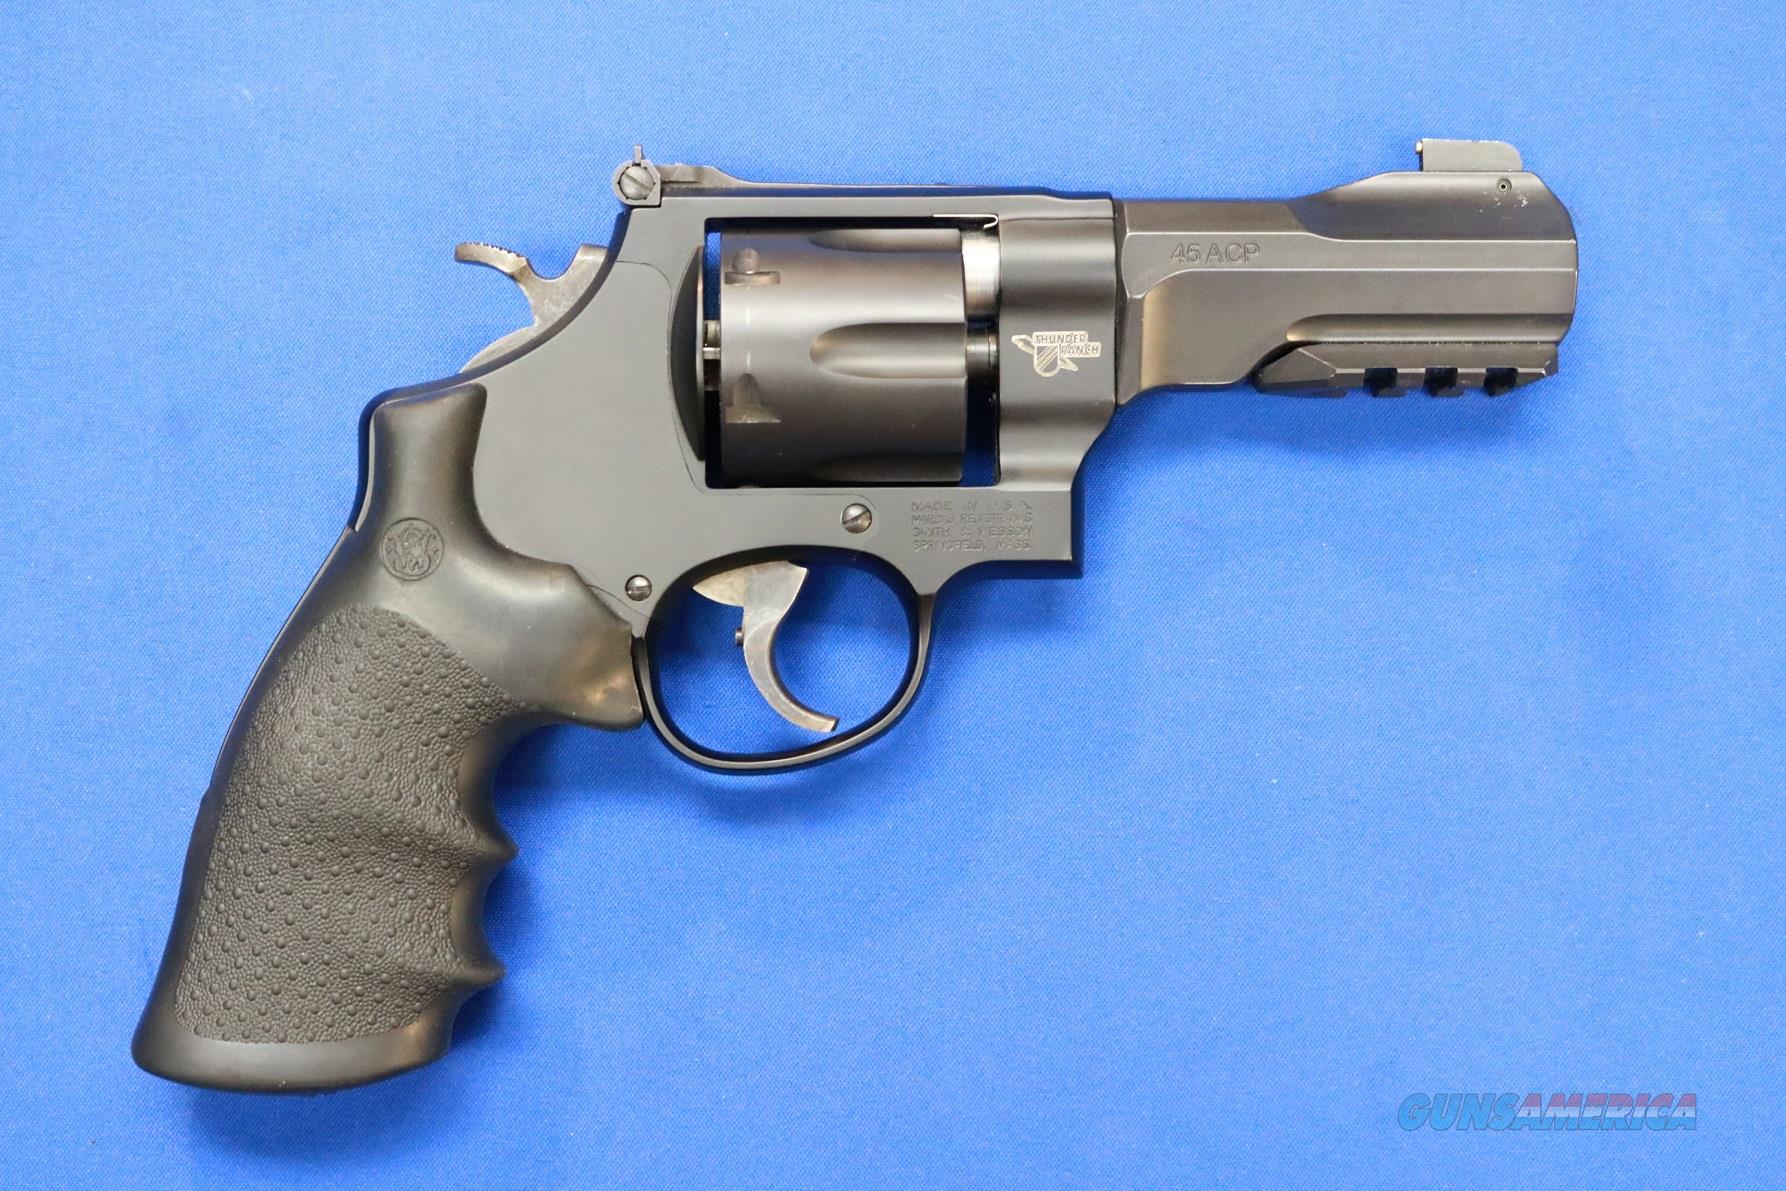 SMITH & WESSON 325 THUNDER RANCH PC .45 ACP   Guns > Pistols > Smith & Wesson Revolvers > Full Frame Revolver